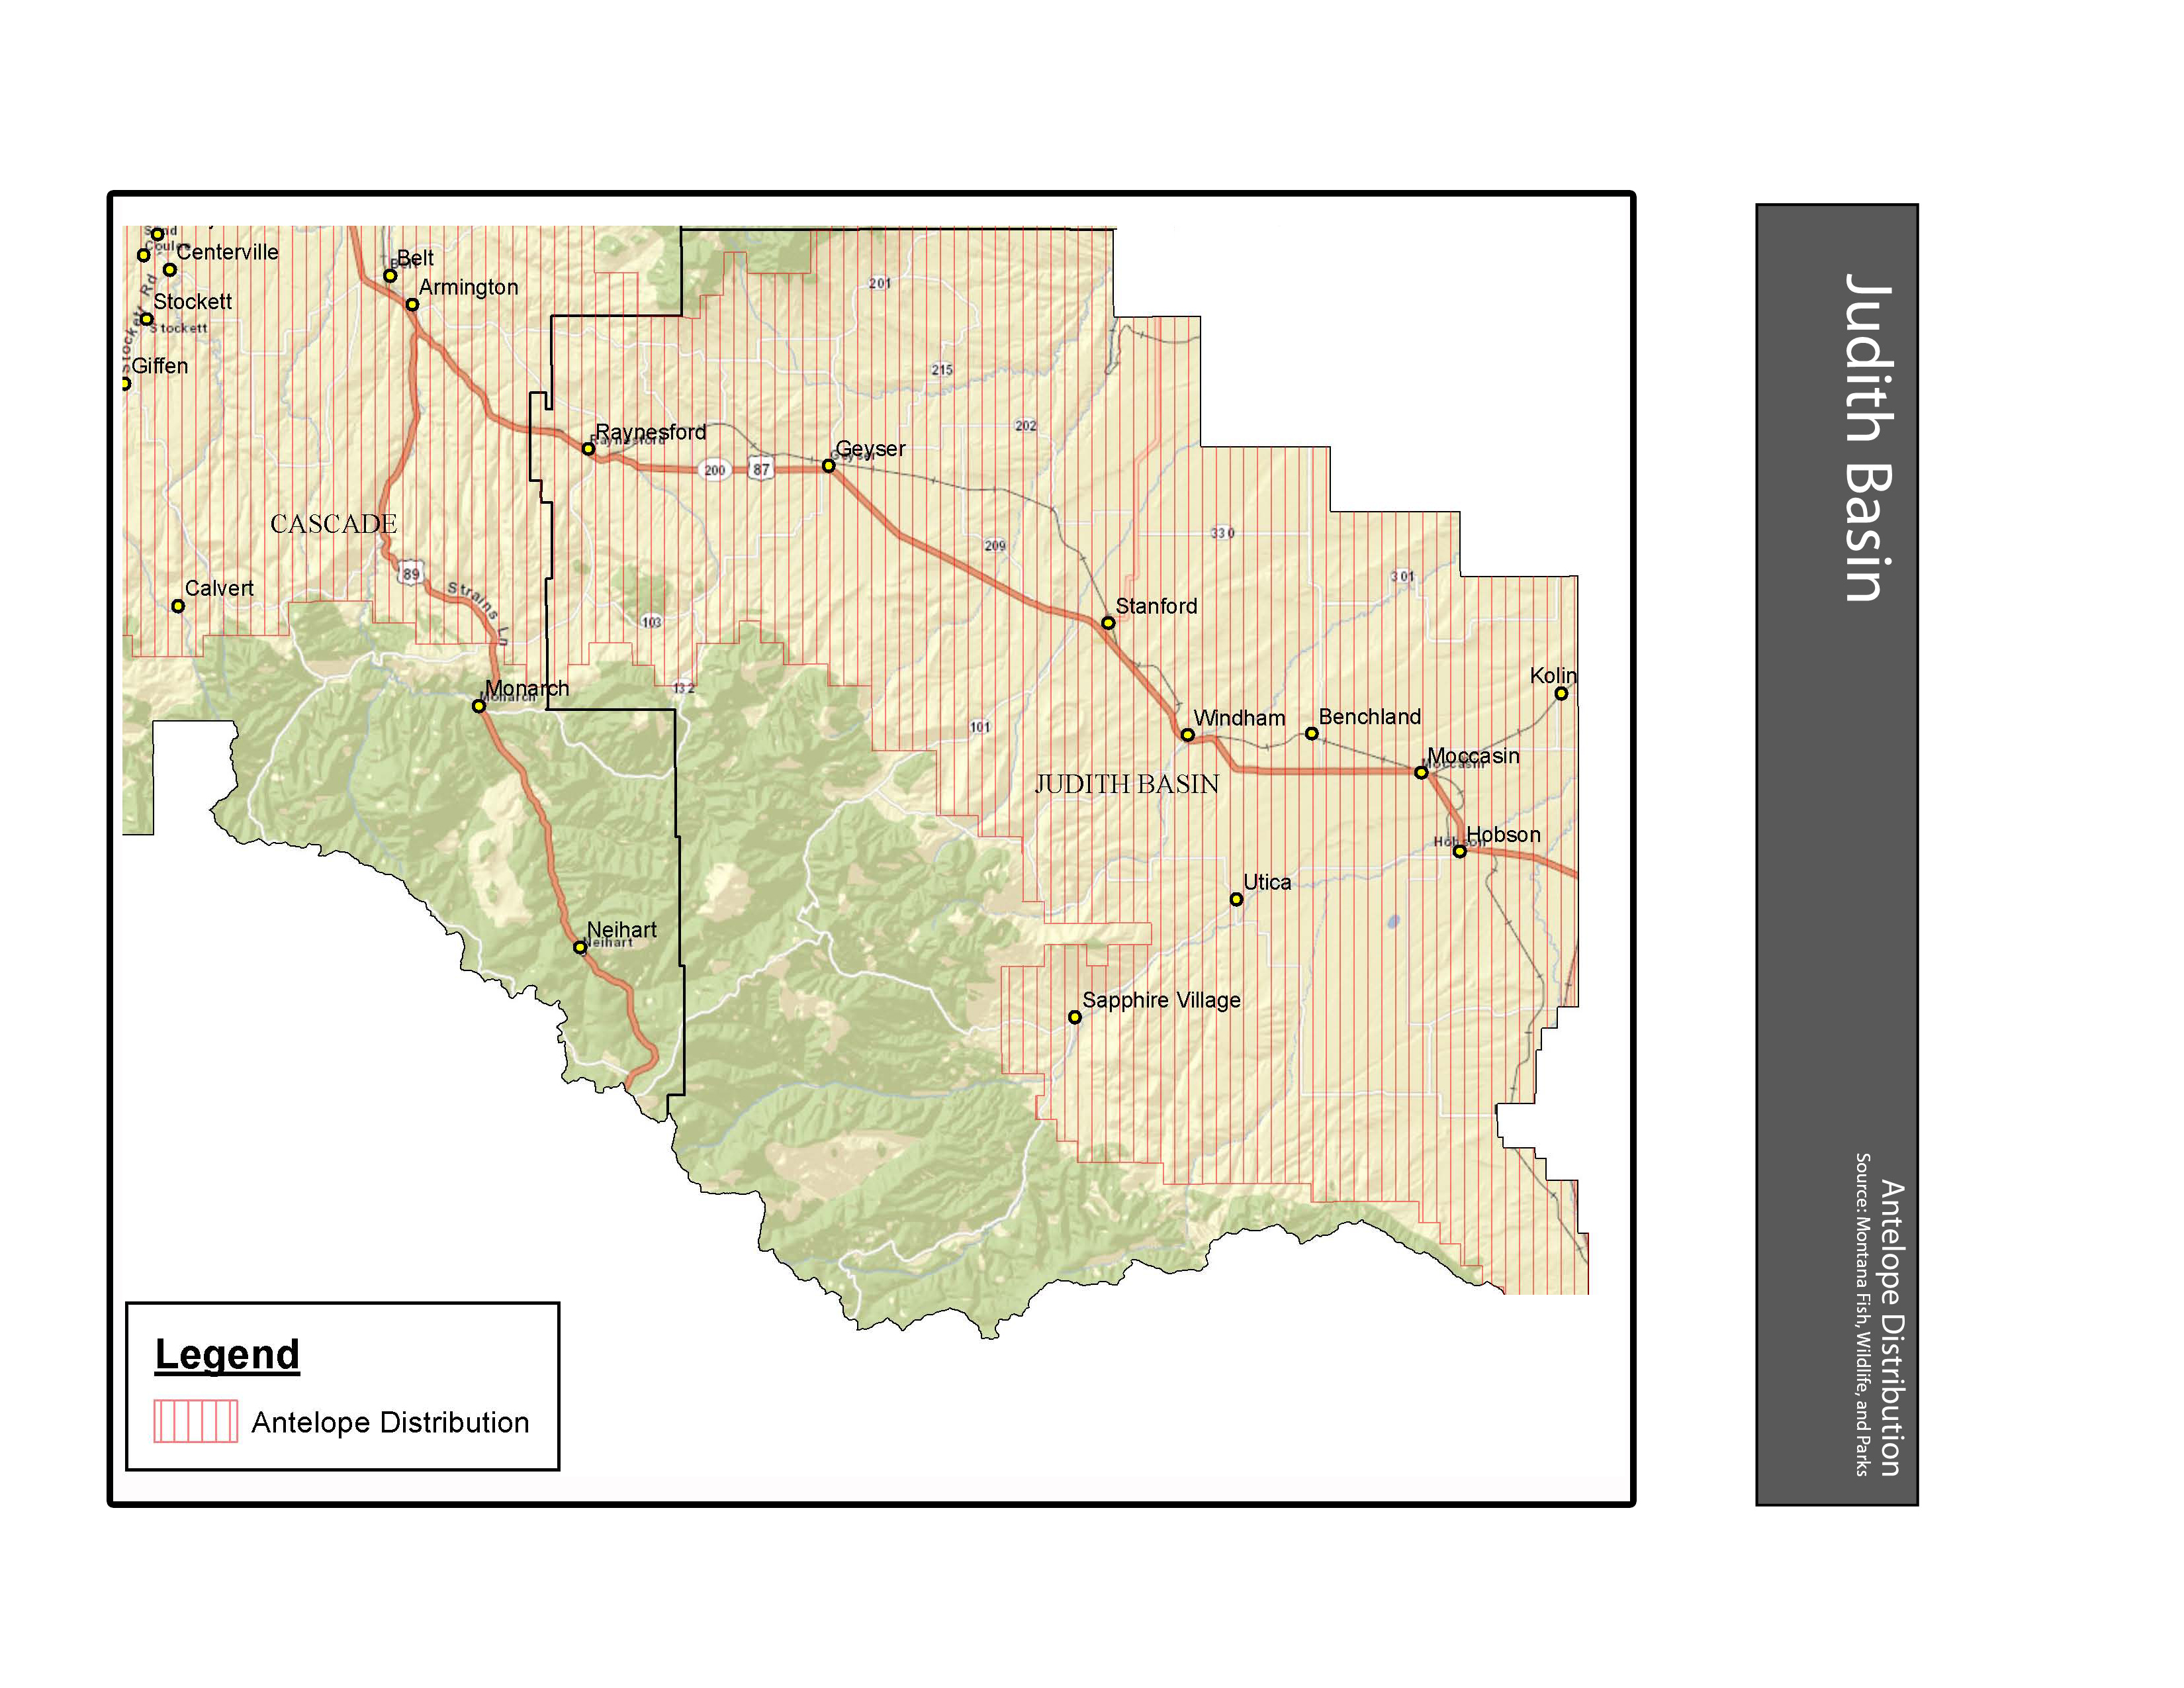 Antelope Distribution Judith Basin County